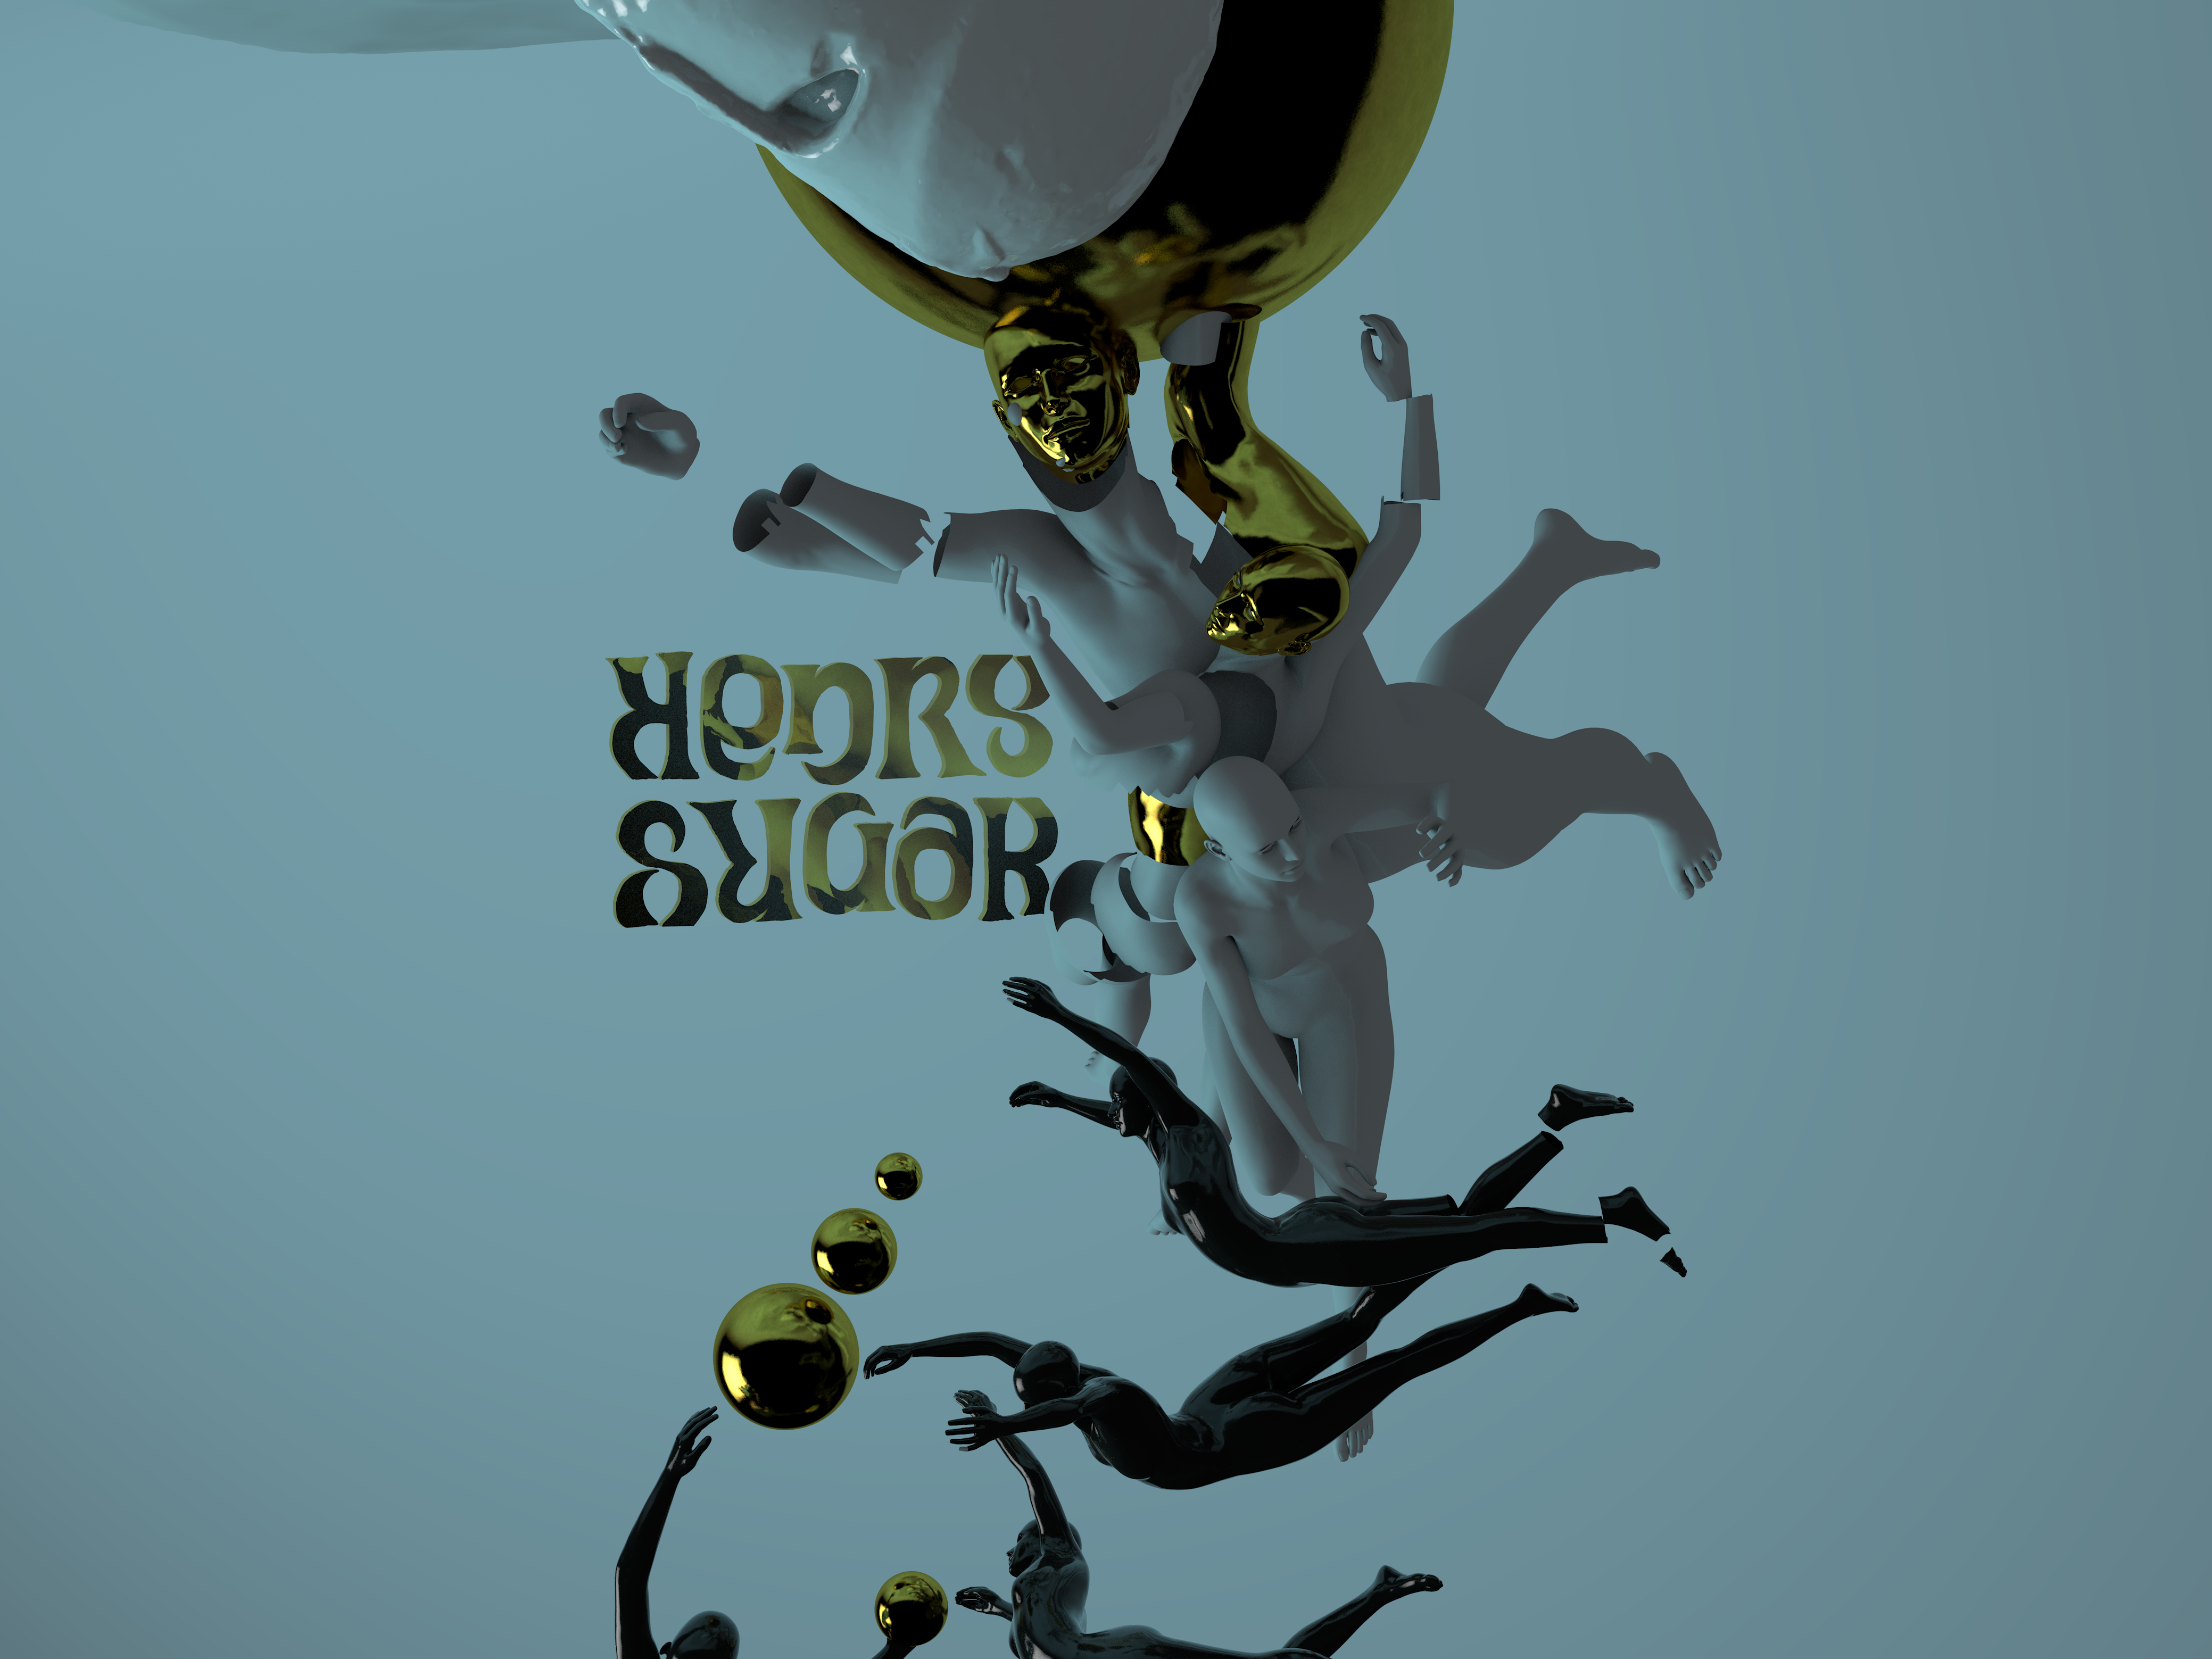 Henry Sugar Falling 2